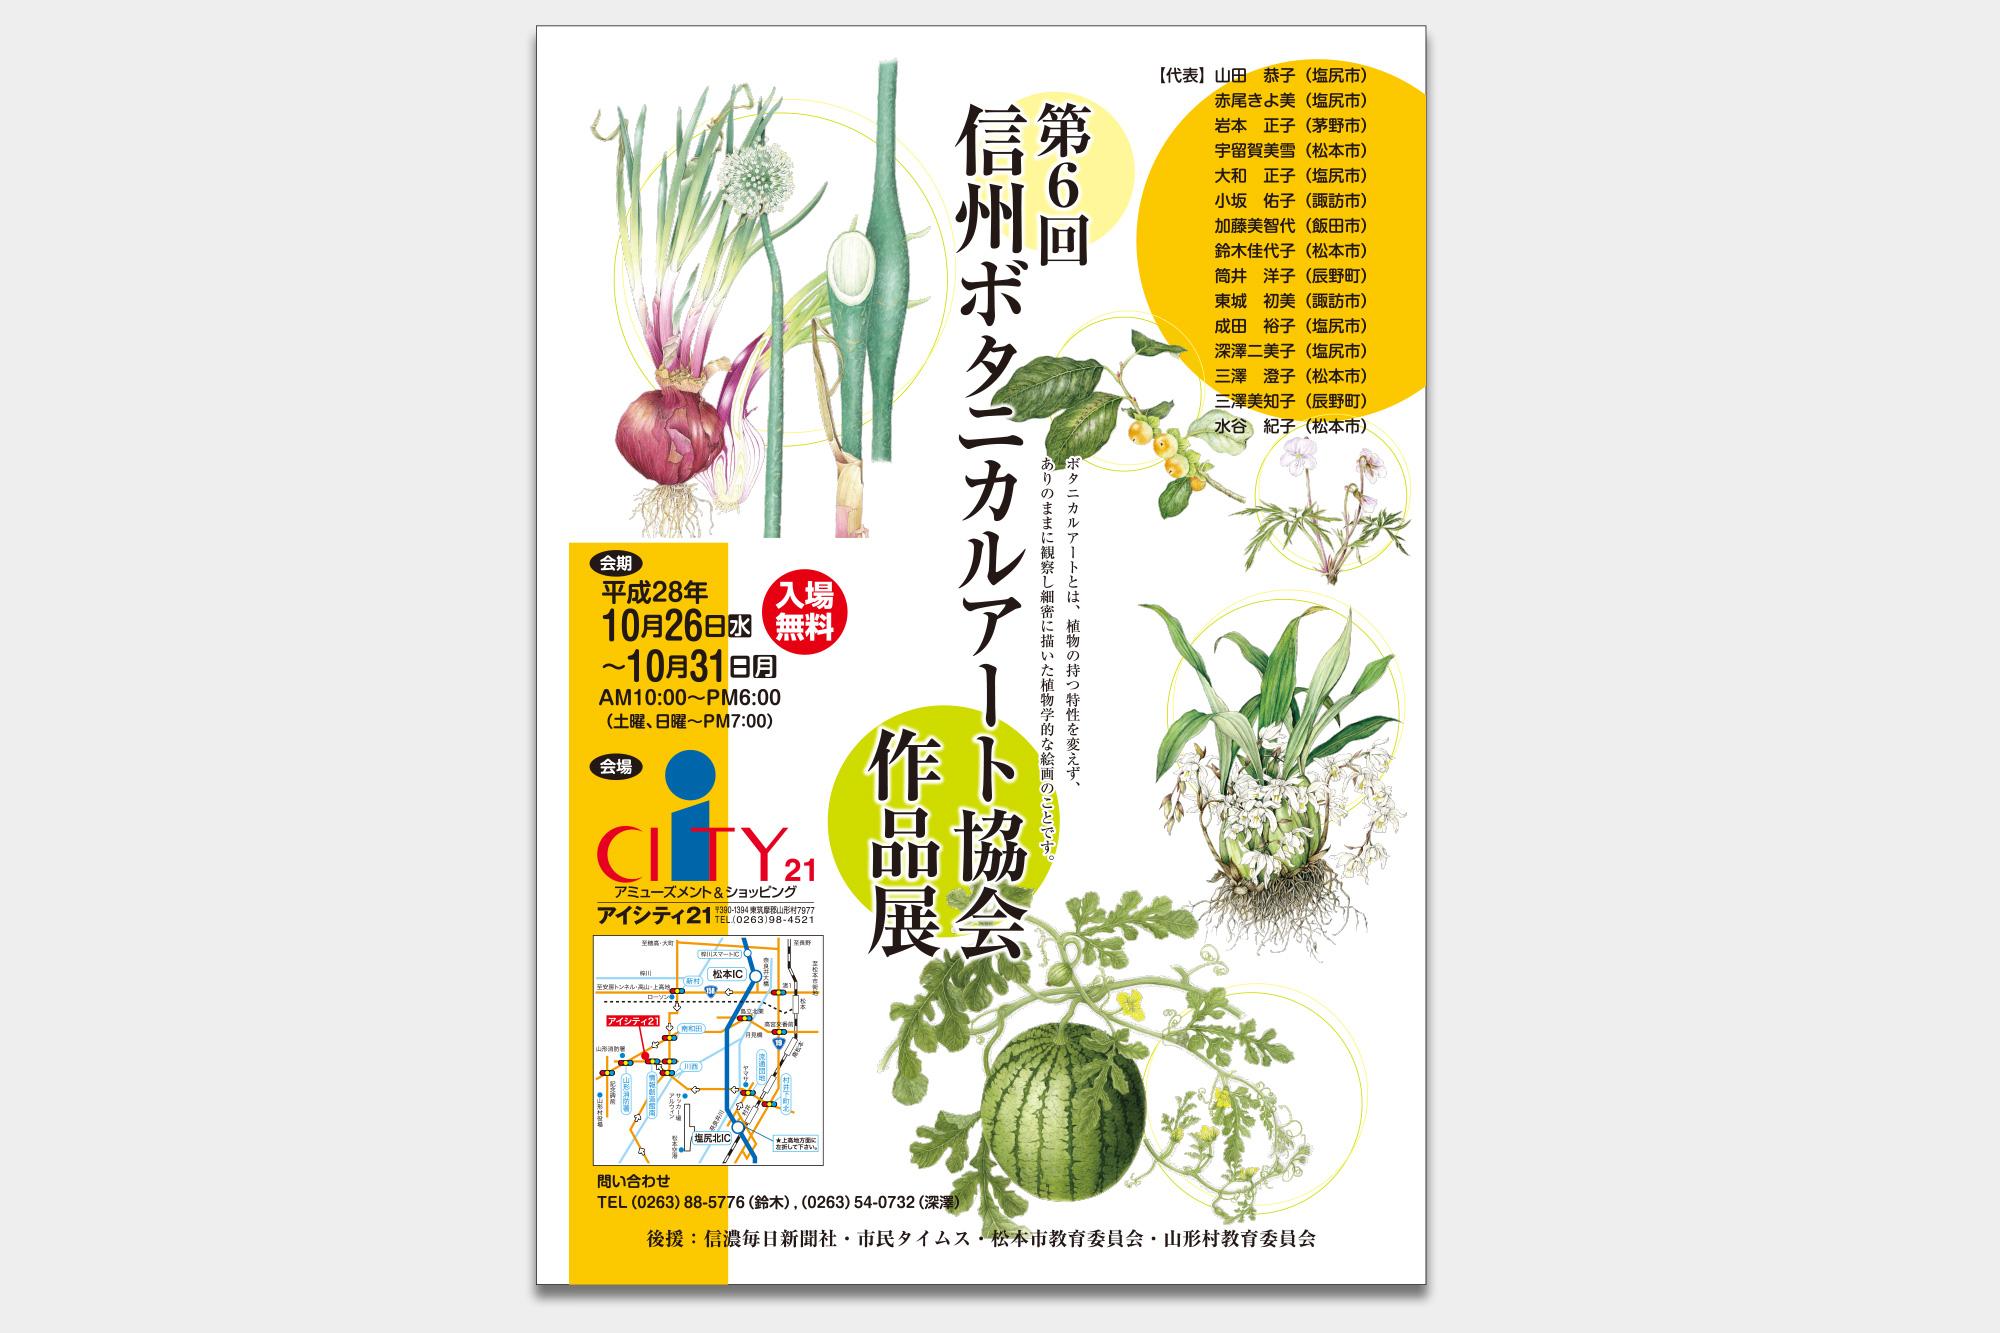 A2ポスター(信州ボタニカルアート協会様)